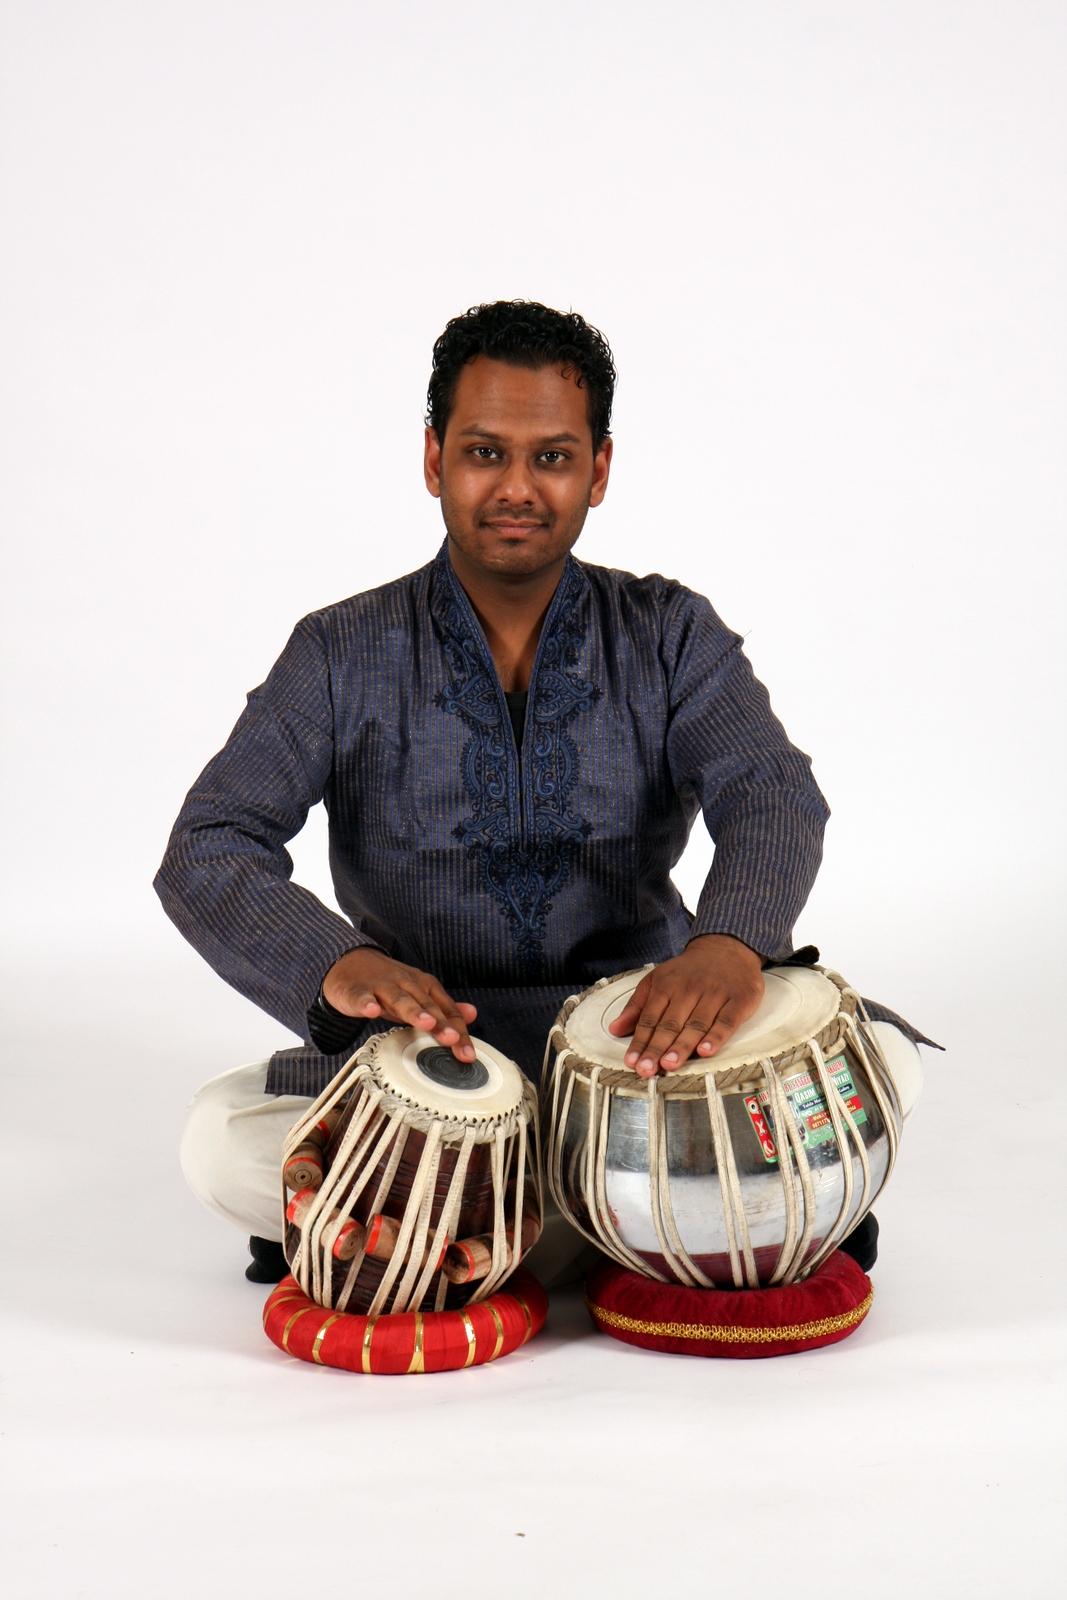 Dinesh Ramcharan